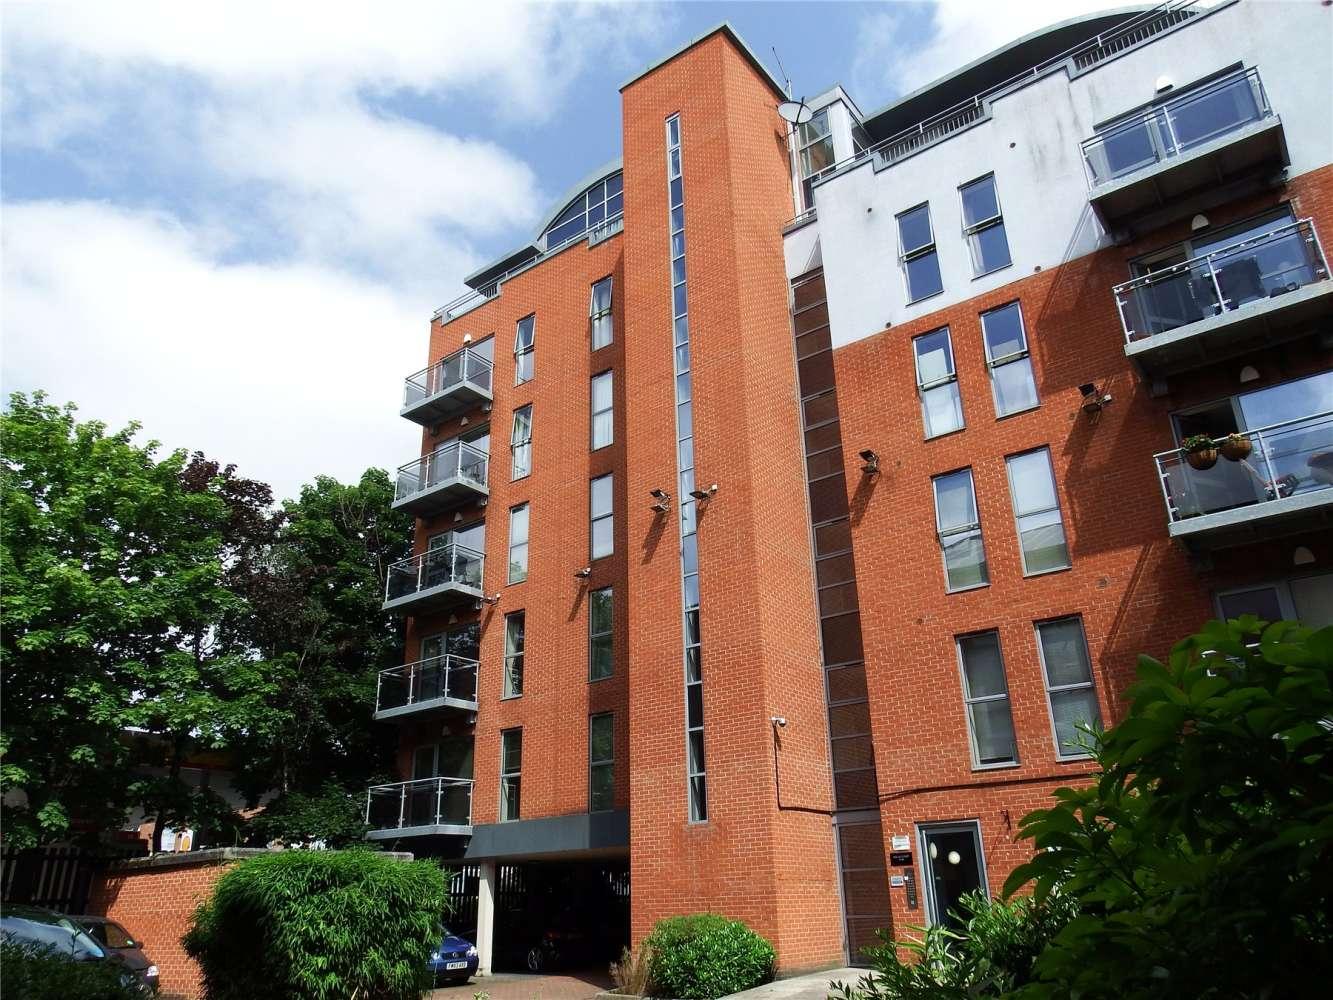 Apartment Leeds, LS2 - Ahlux Court Millwright Street Leeds West Yorkshire - 00